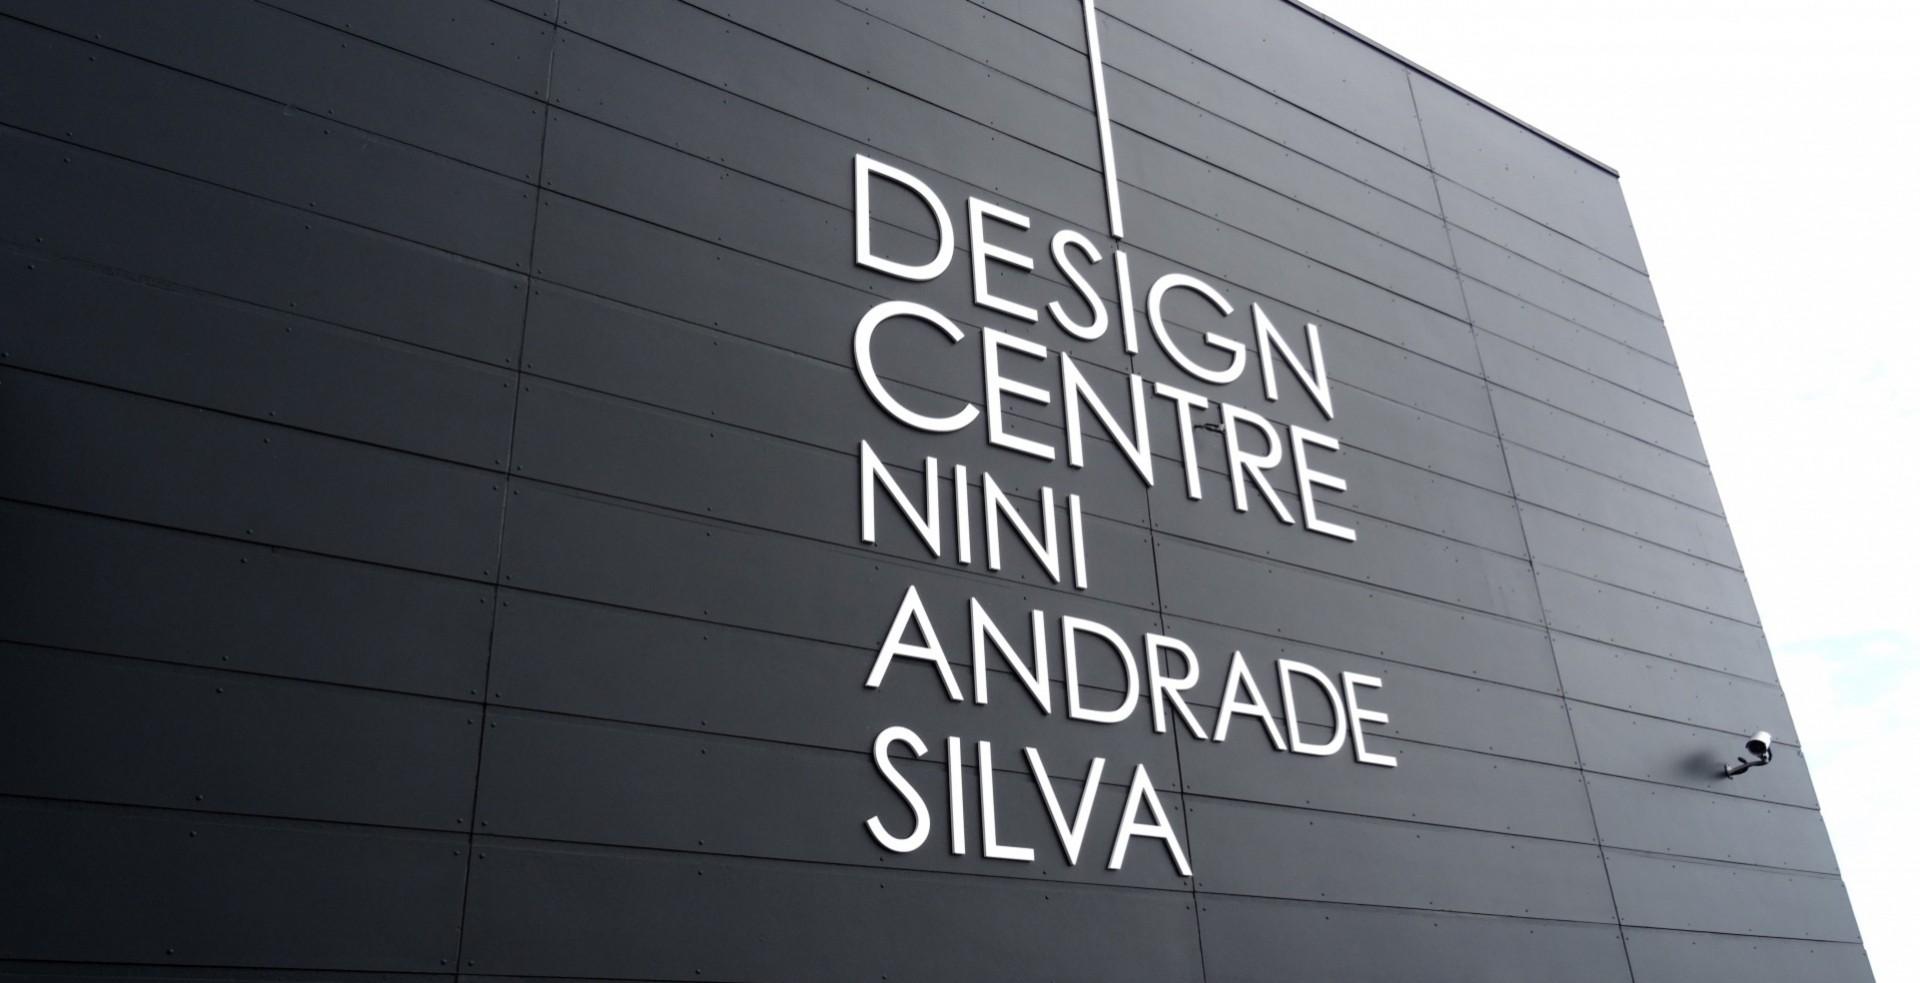 Best Portuguese Interior Designers: Nini Andrade Silva best portuguese interior designers Best Portuguese Interior Designers: Nini Andrade Silva's Interview 7483597